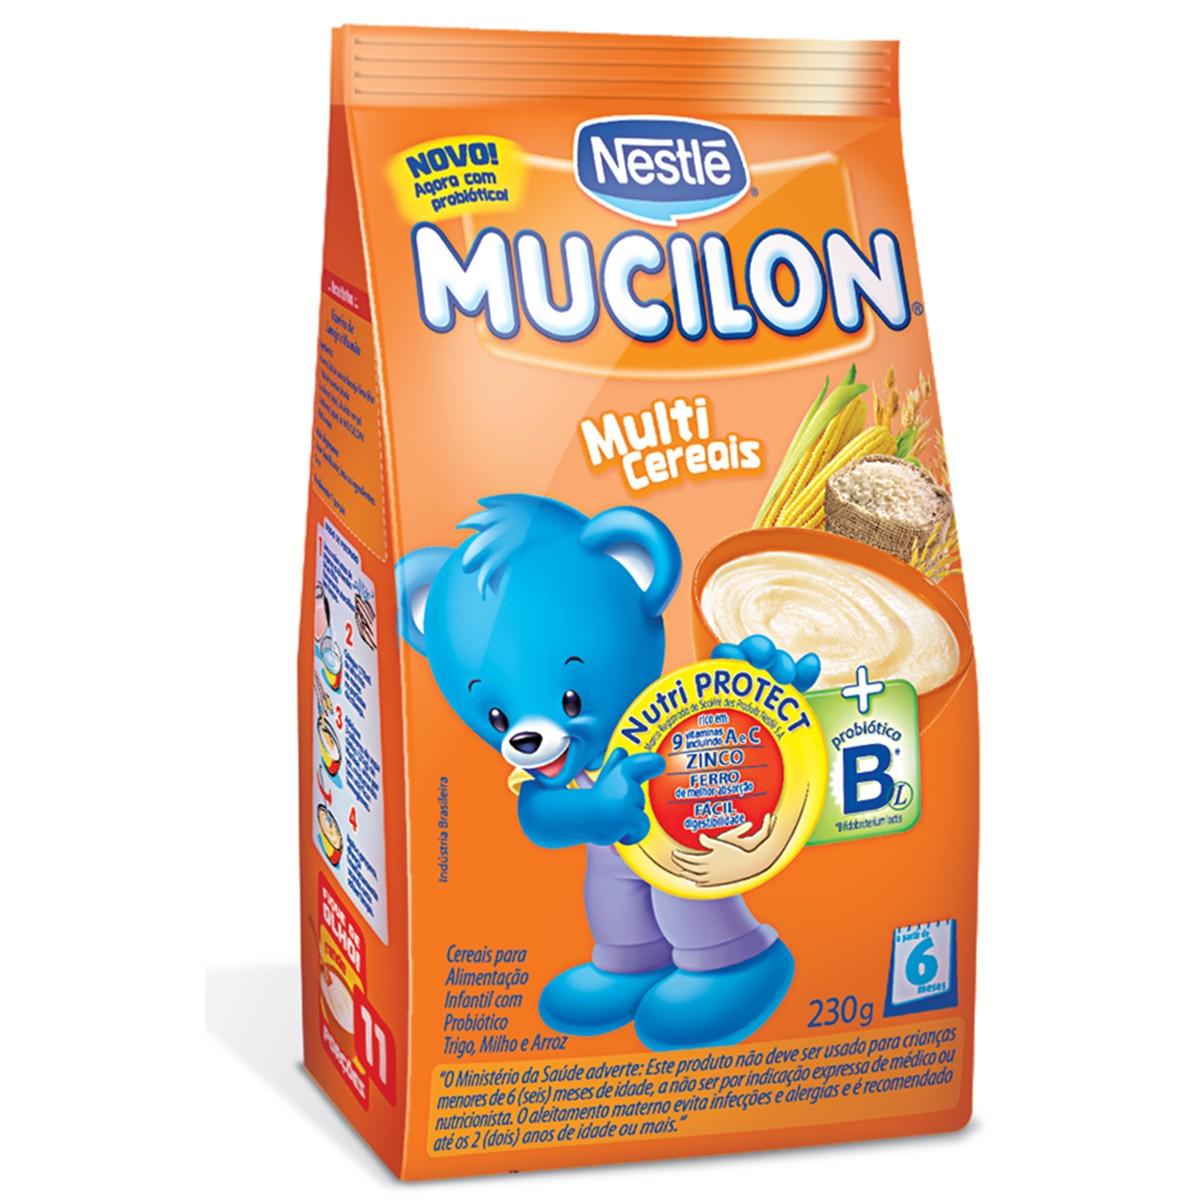 MUCILON BL MULTICEREAIS